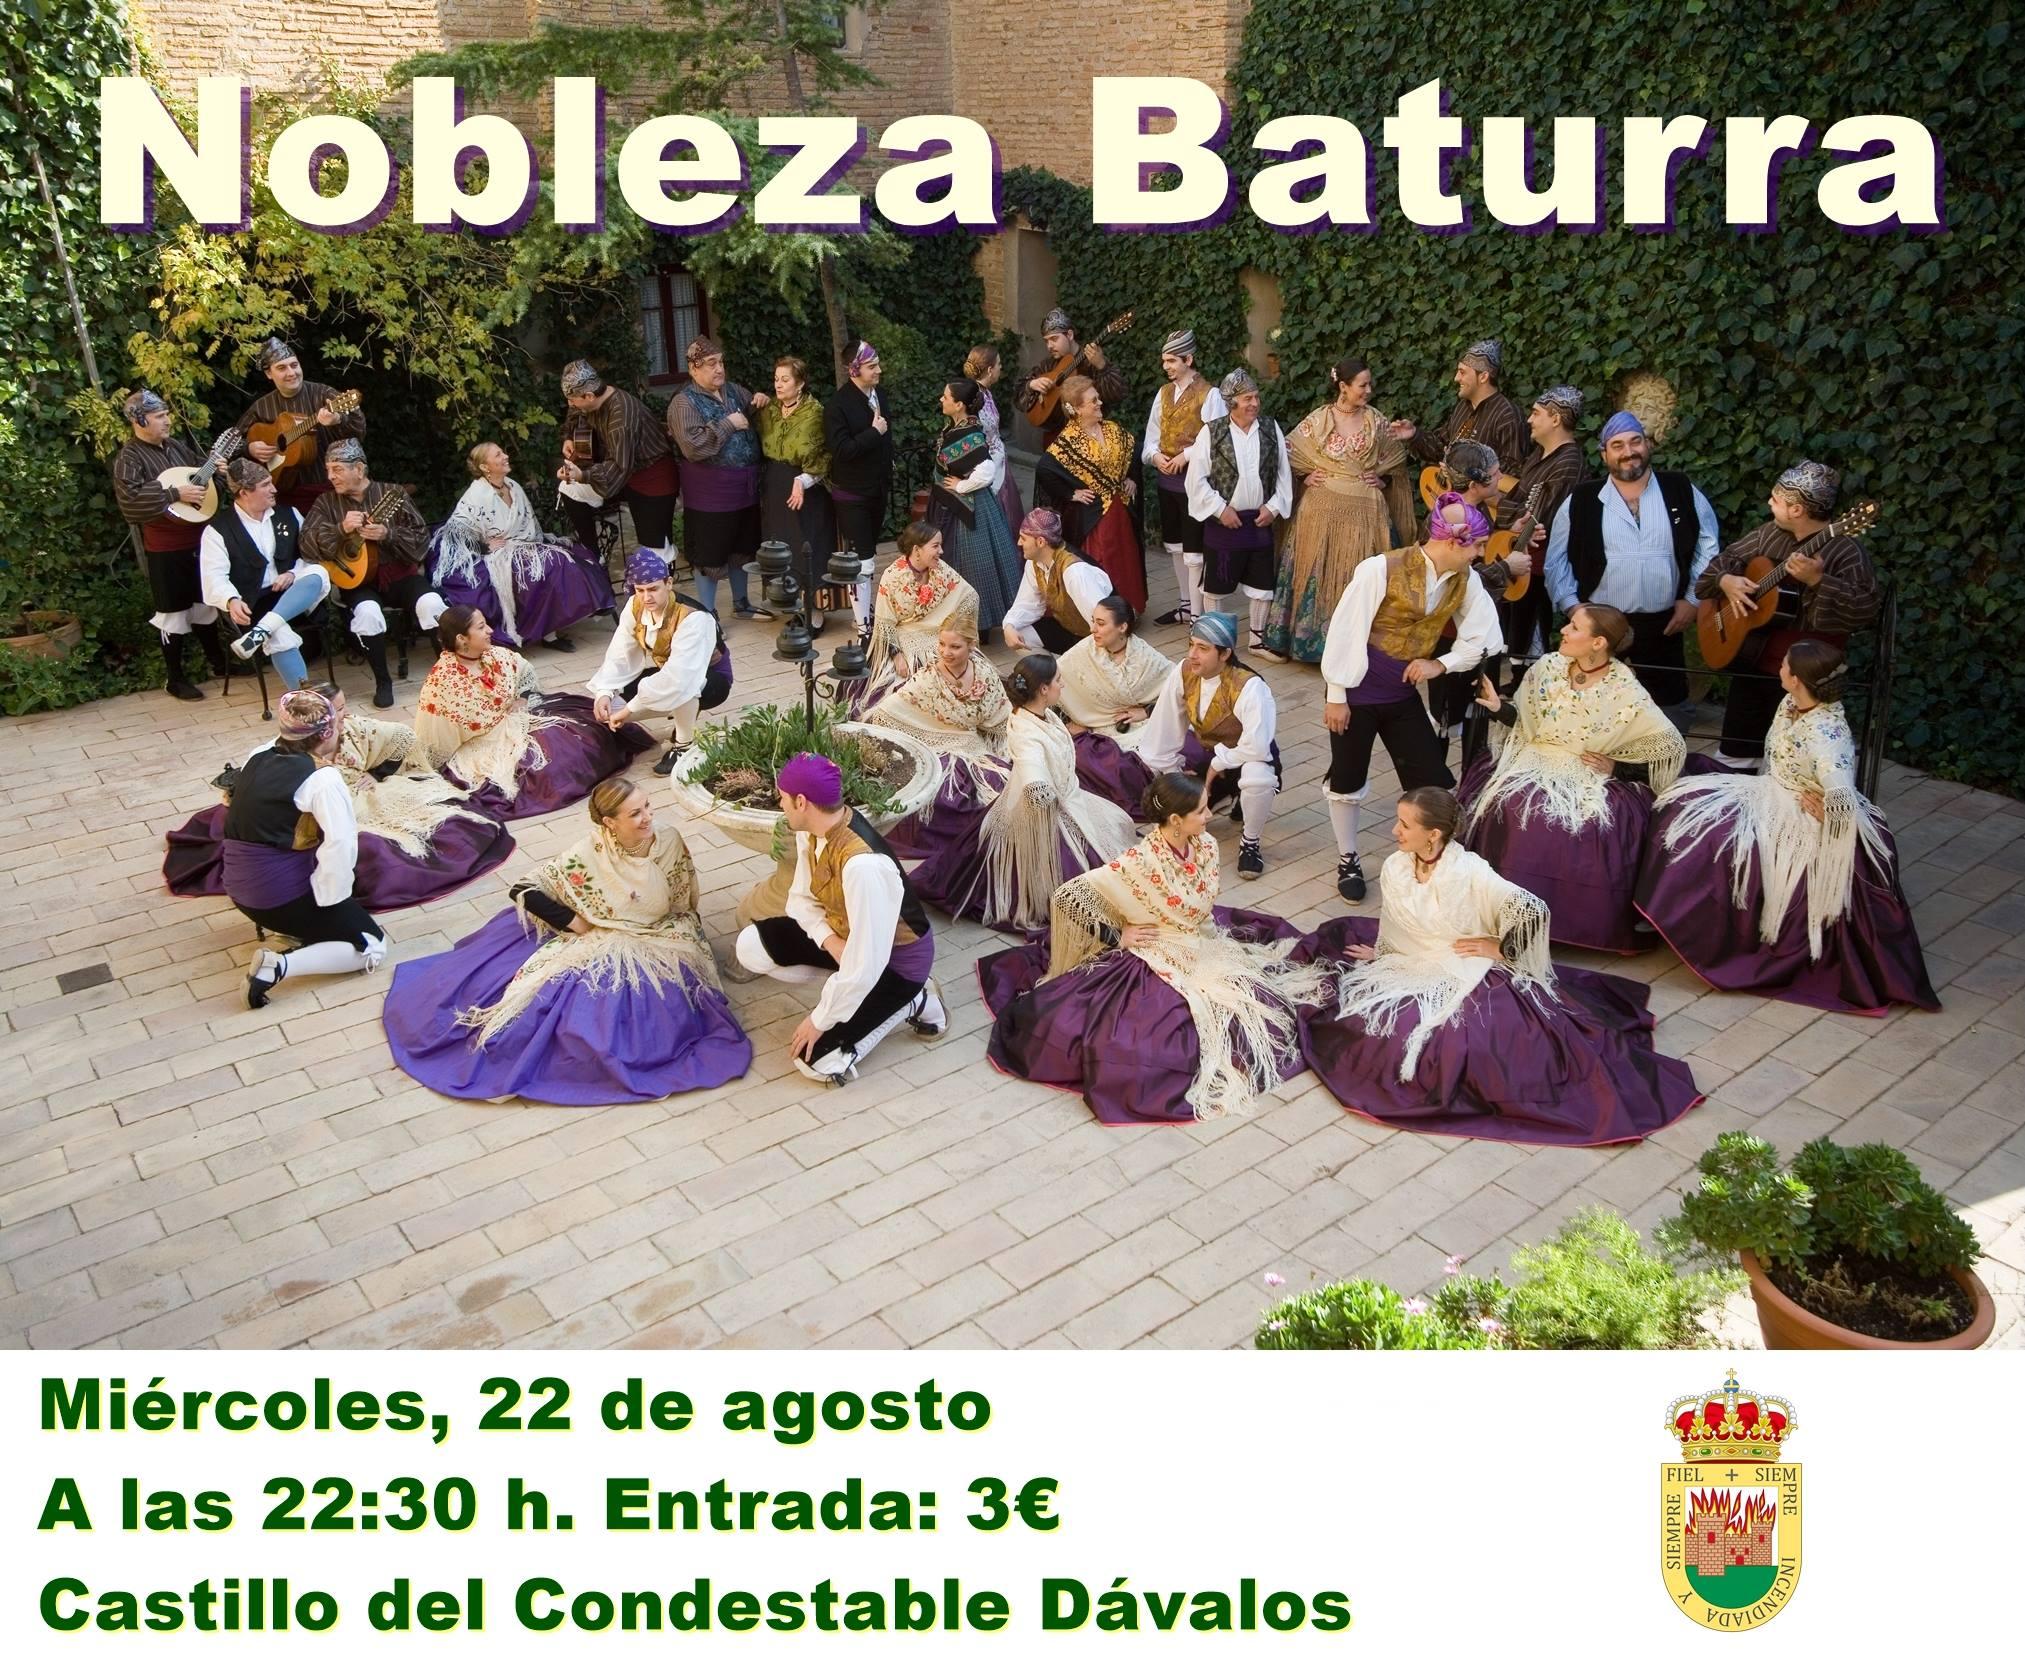 Nobleza Baturra - Arenas de San Pedro - TiétarTeVe